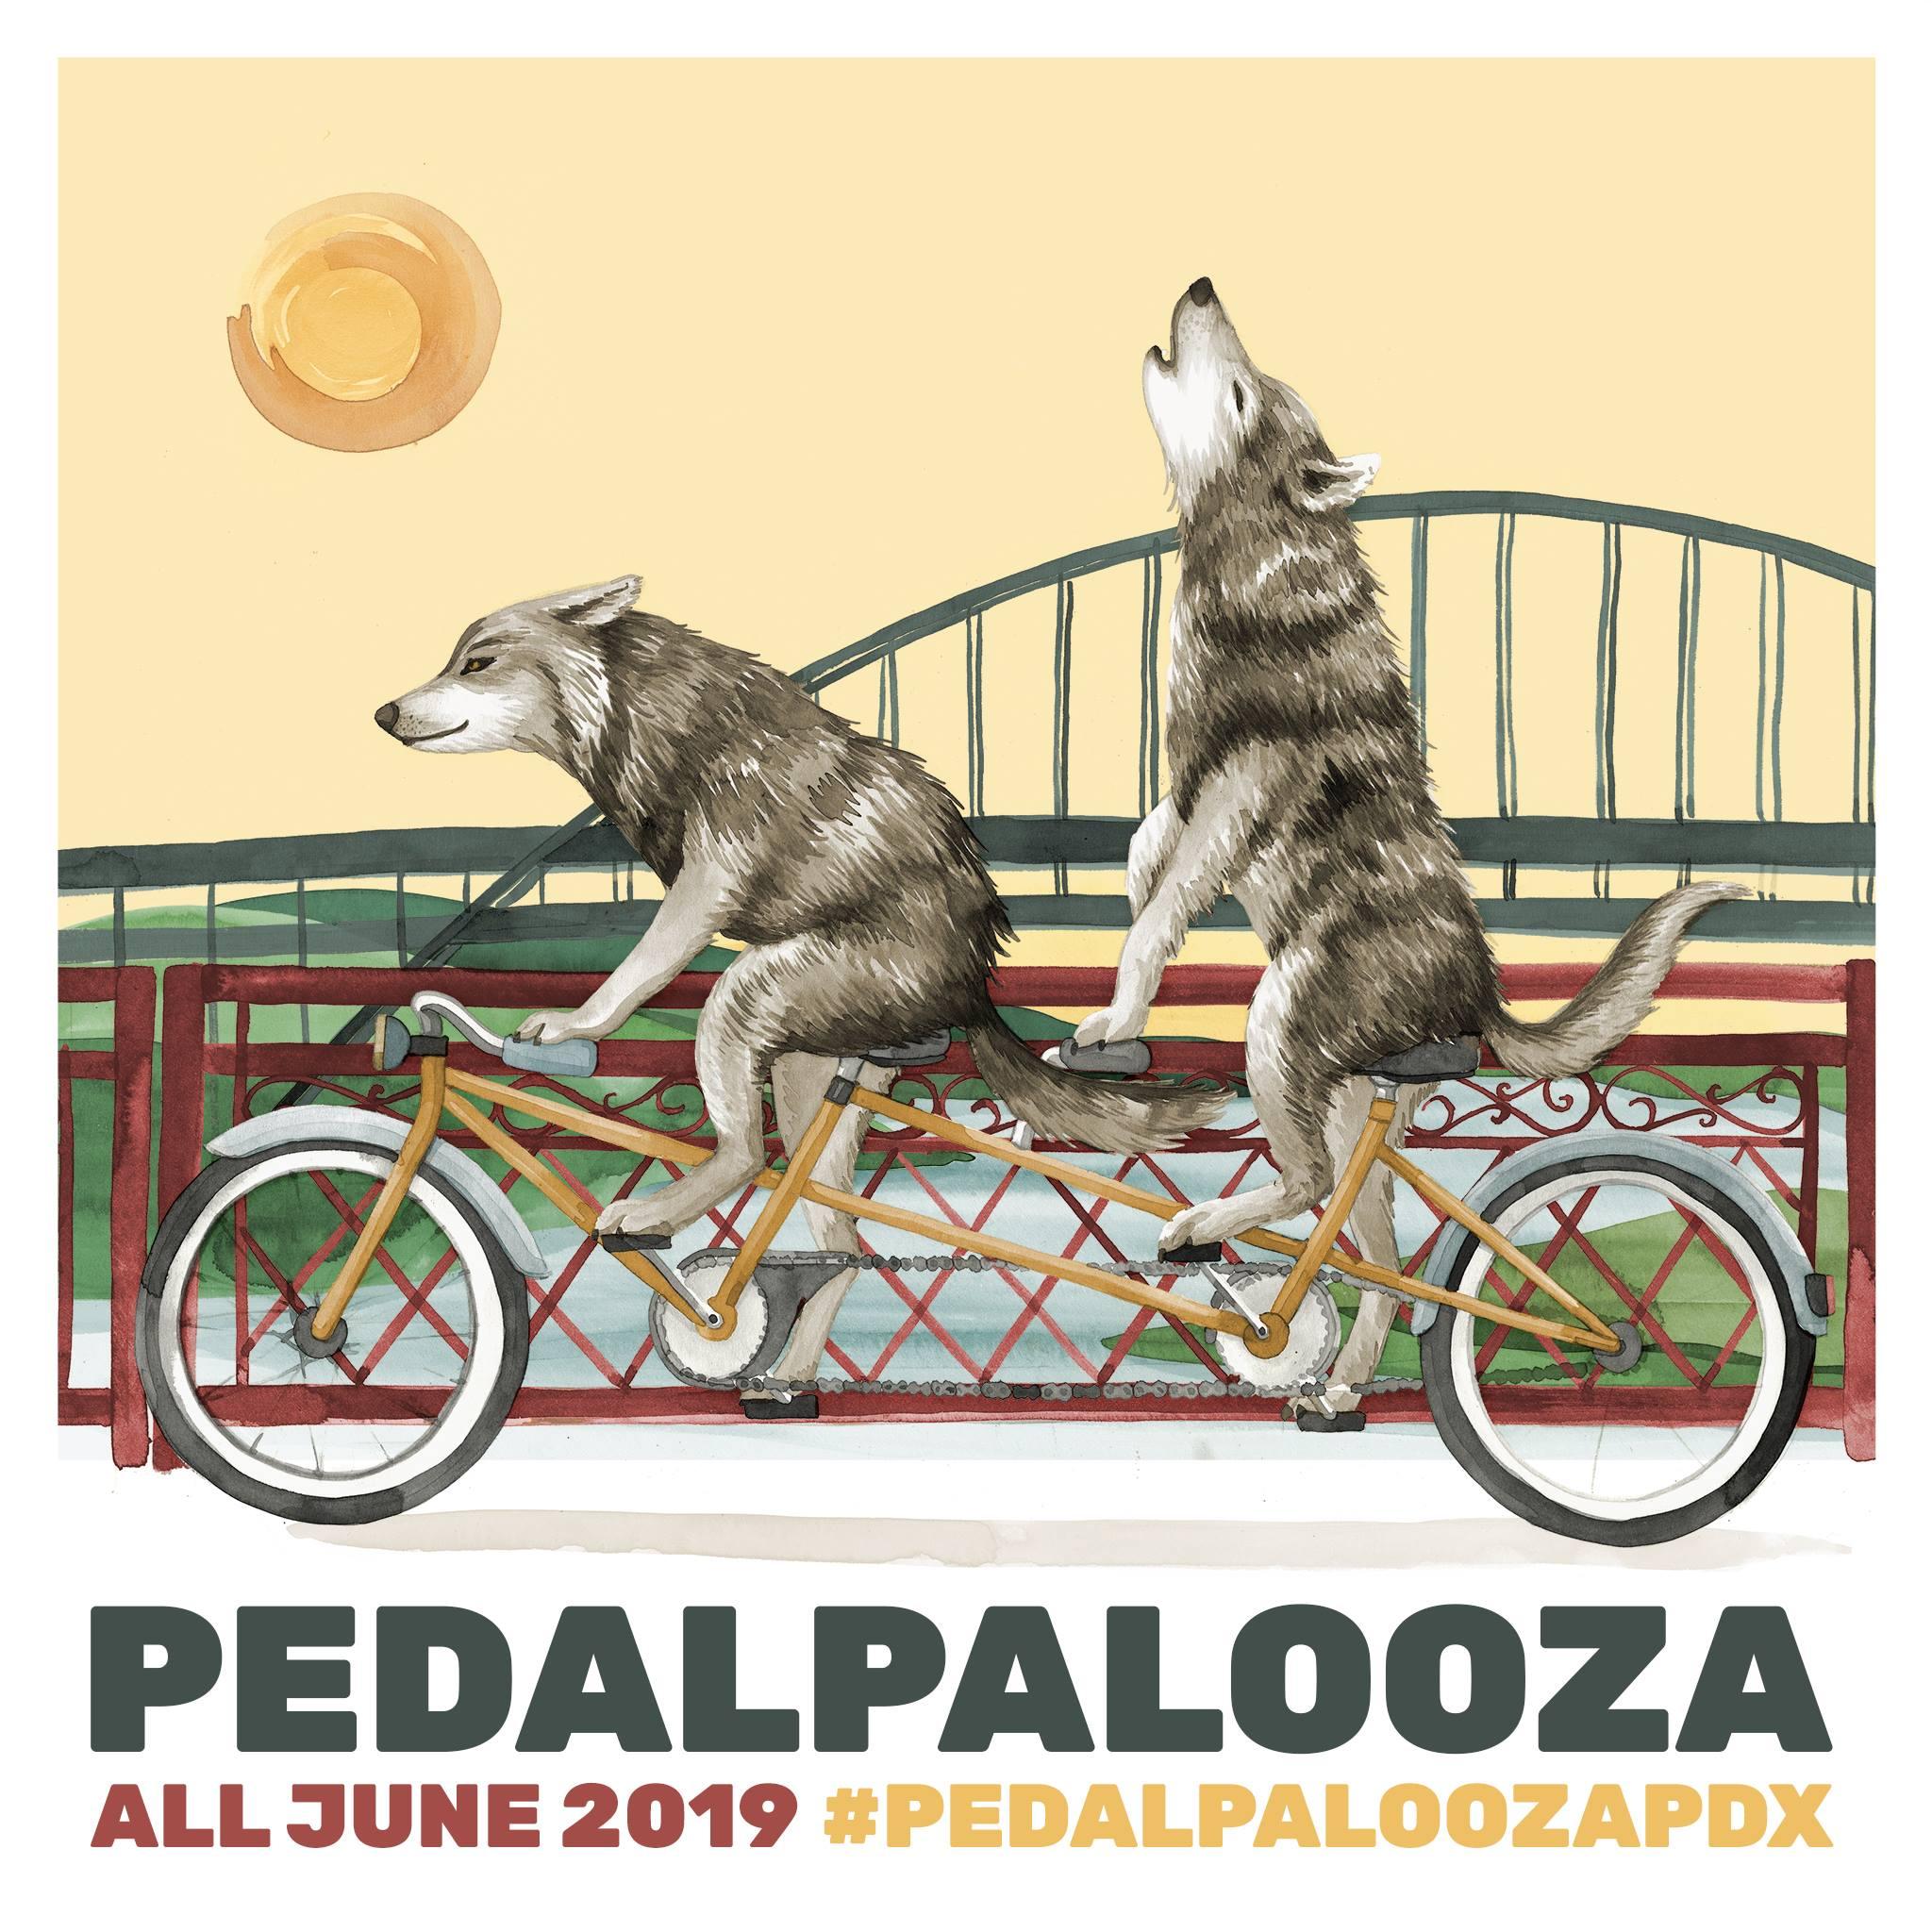 Pedalpalooza 2019.jpg